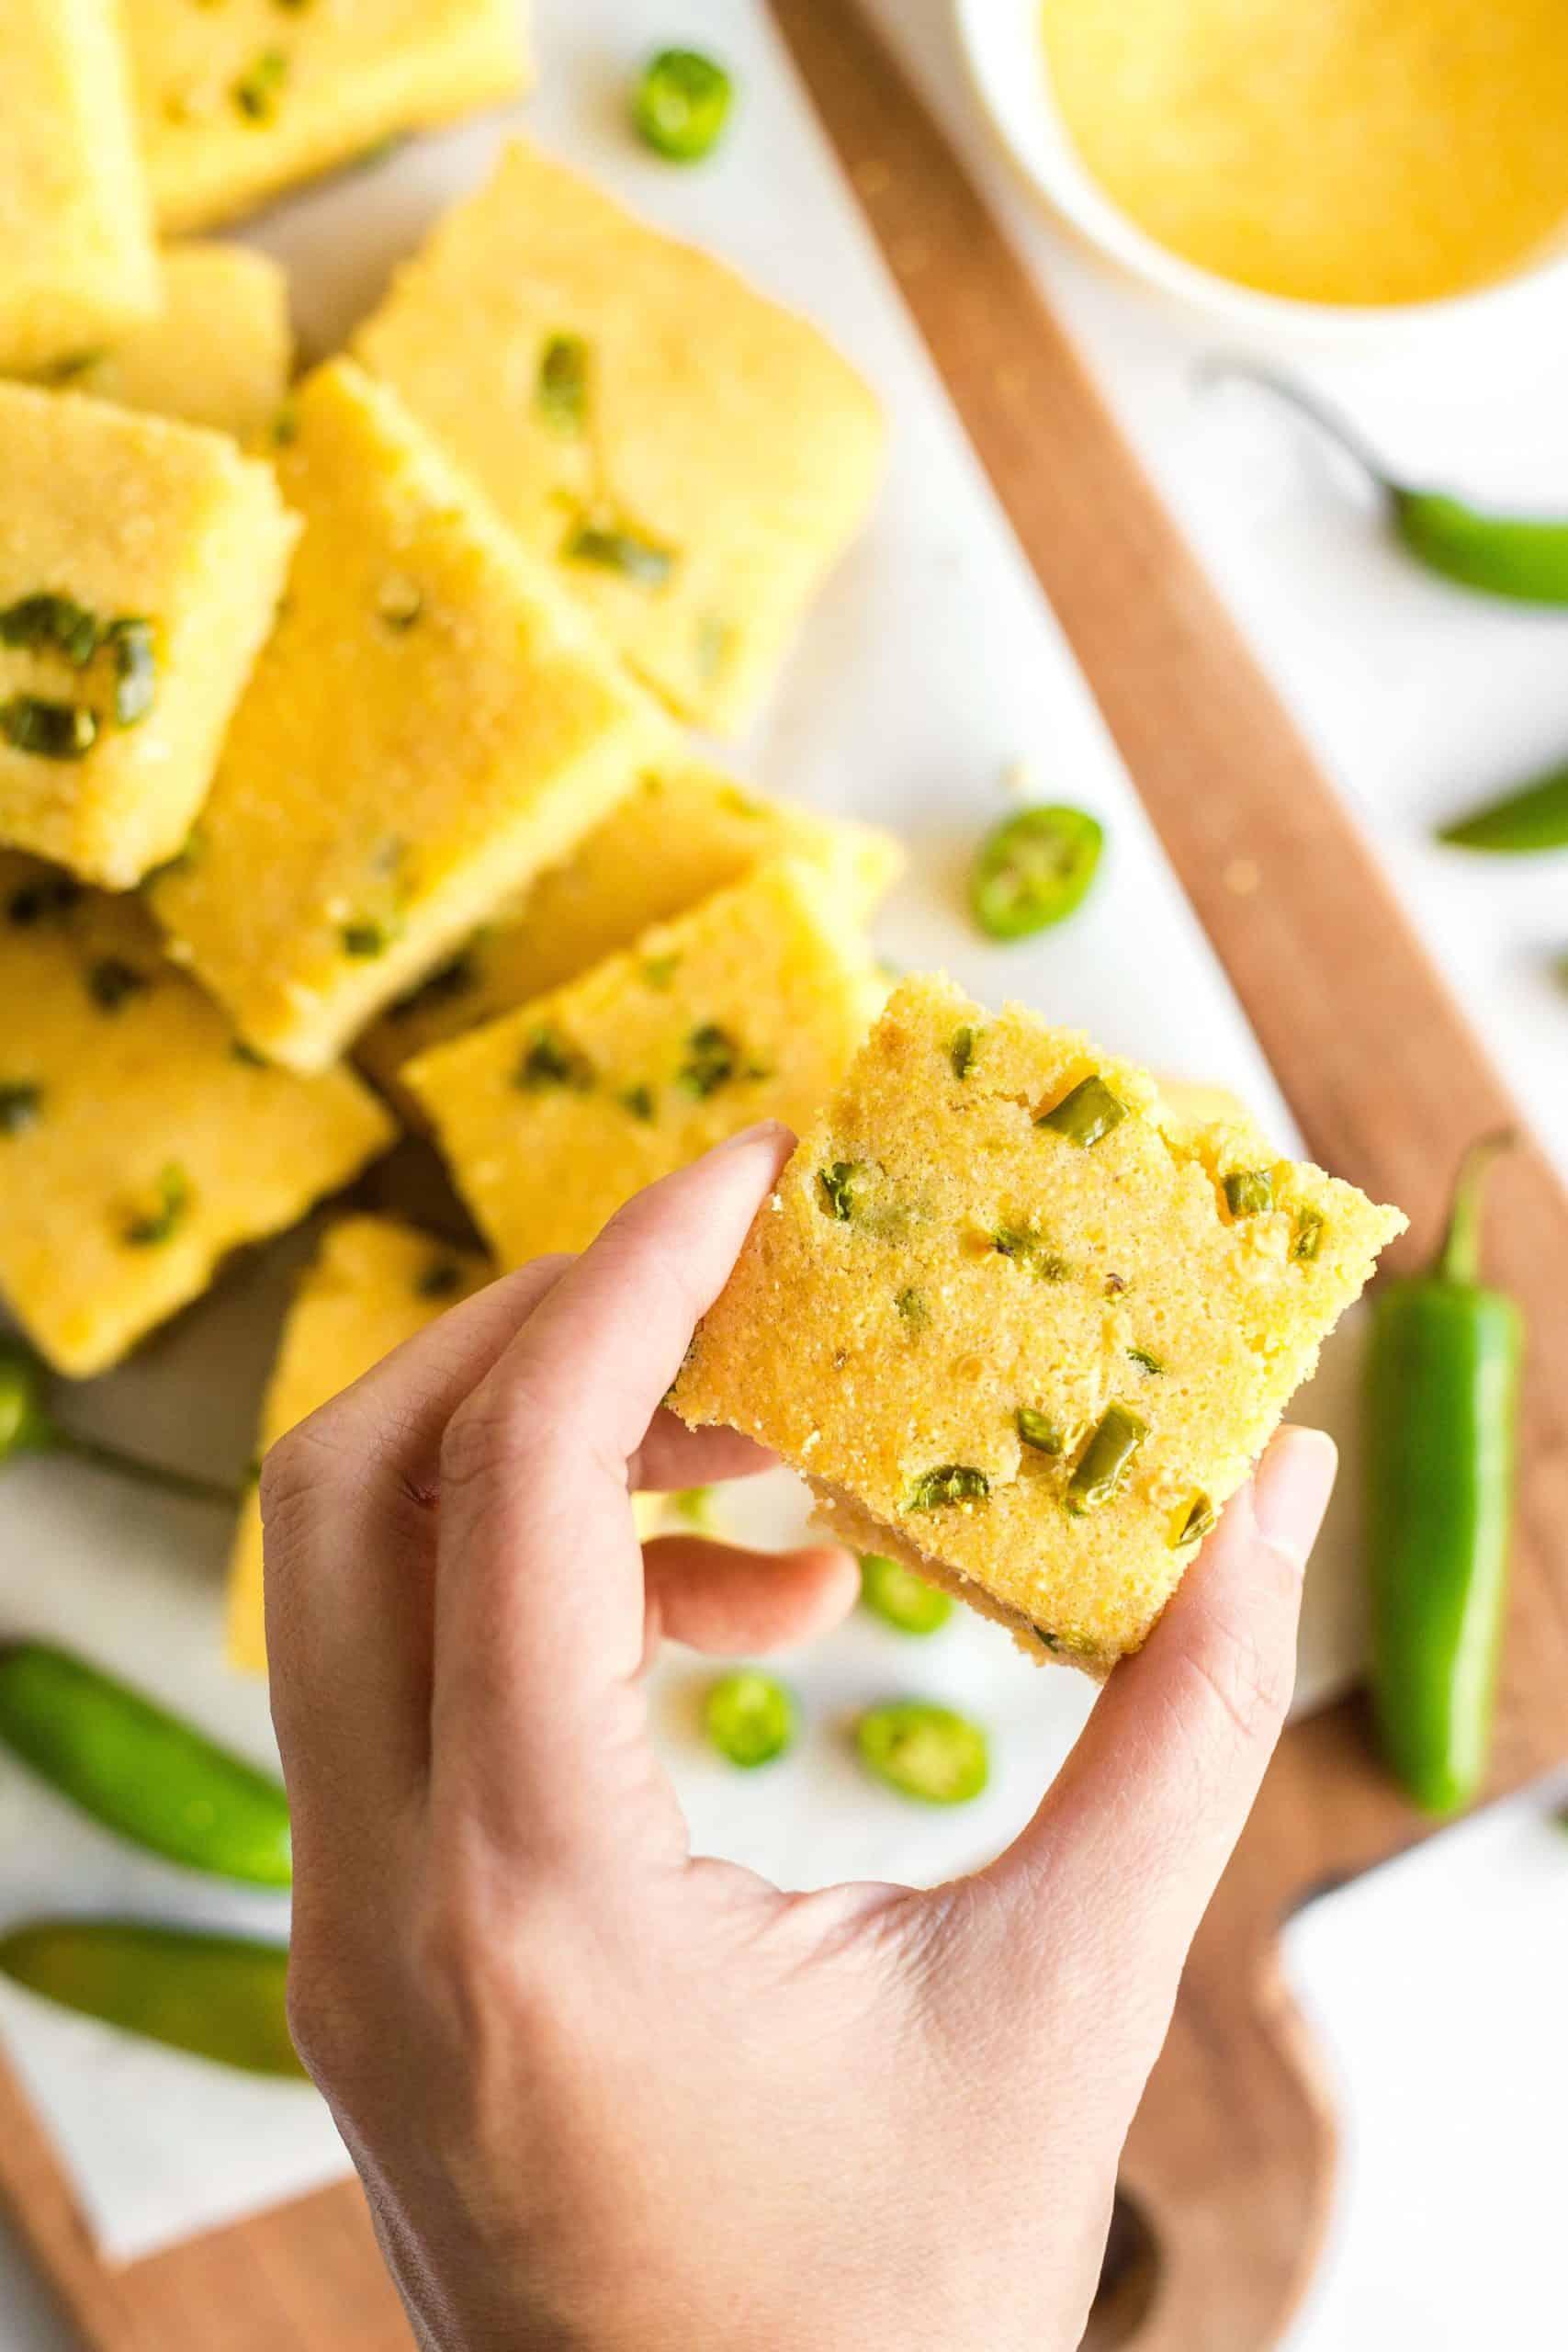 A hand holding up a piece of jalapeño cornbread.